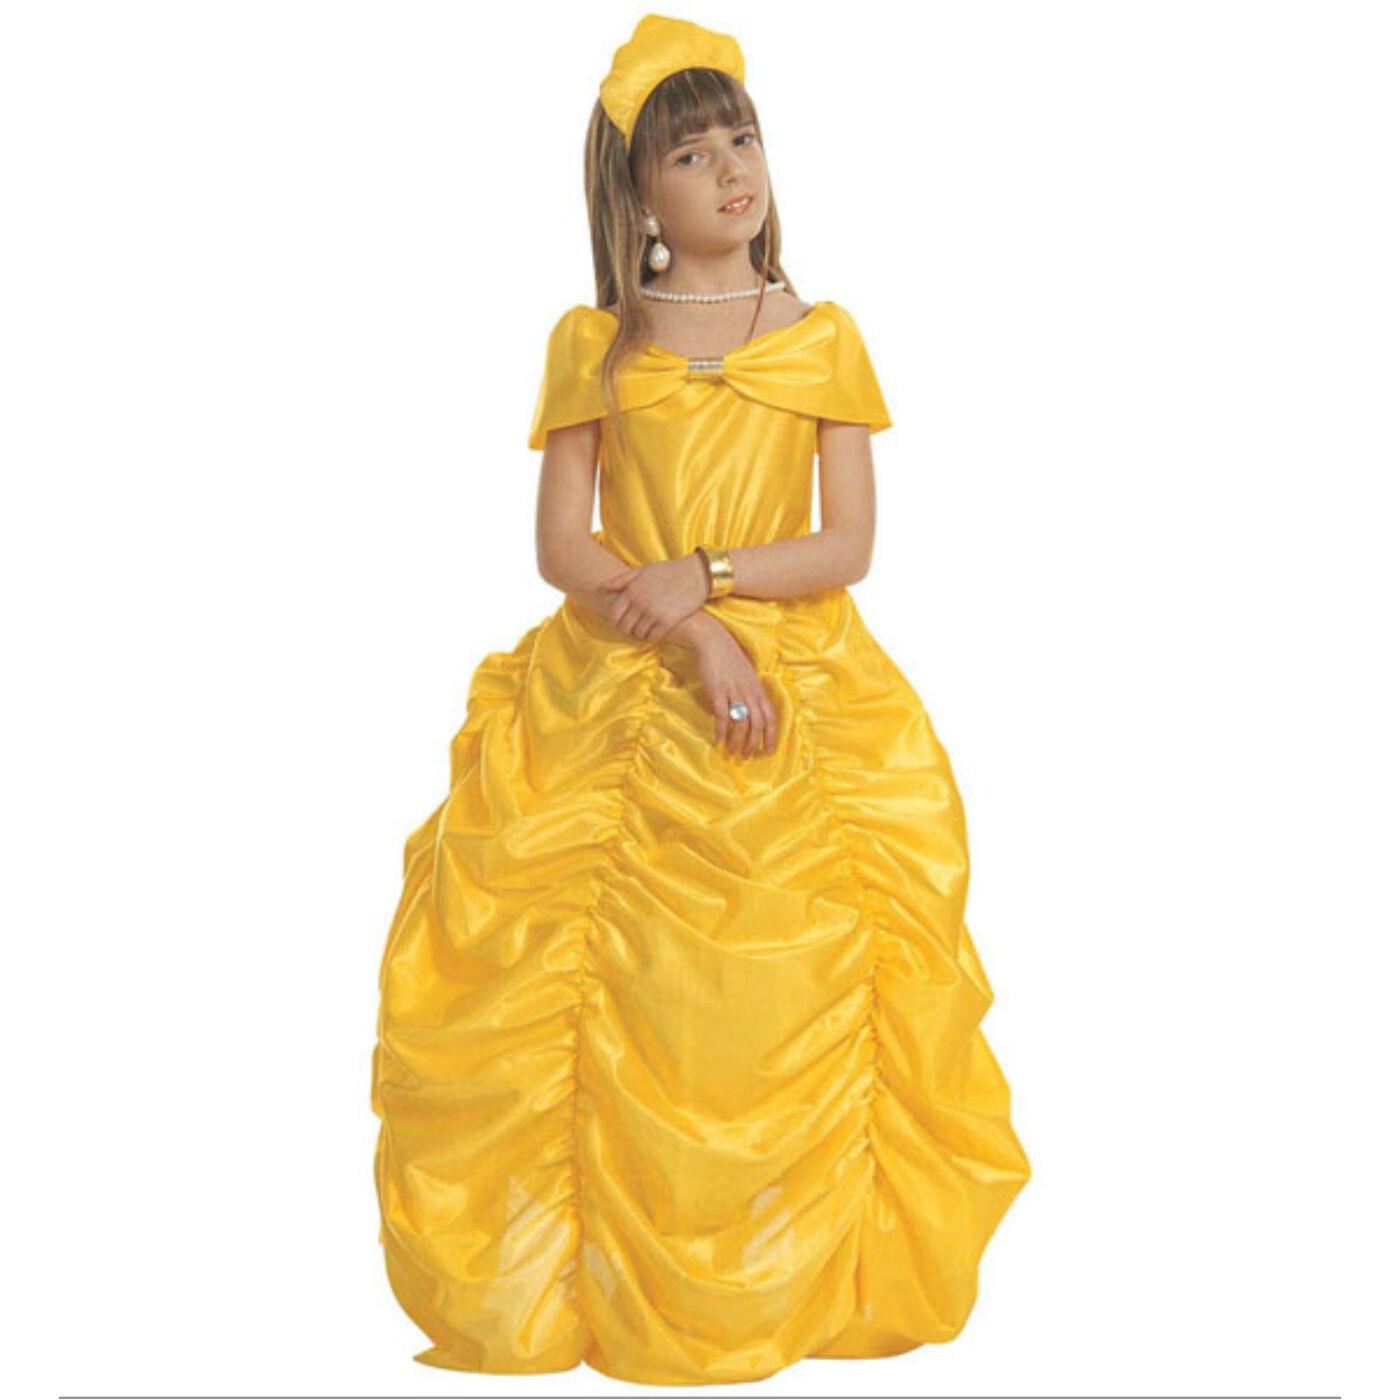 Sárga hercegnő jelmez 158-as